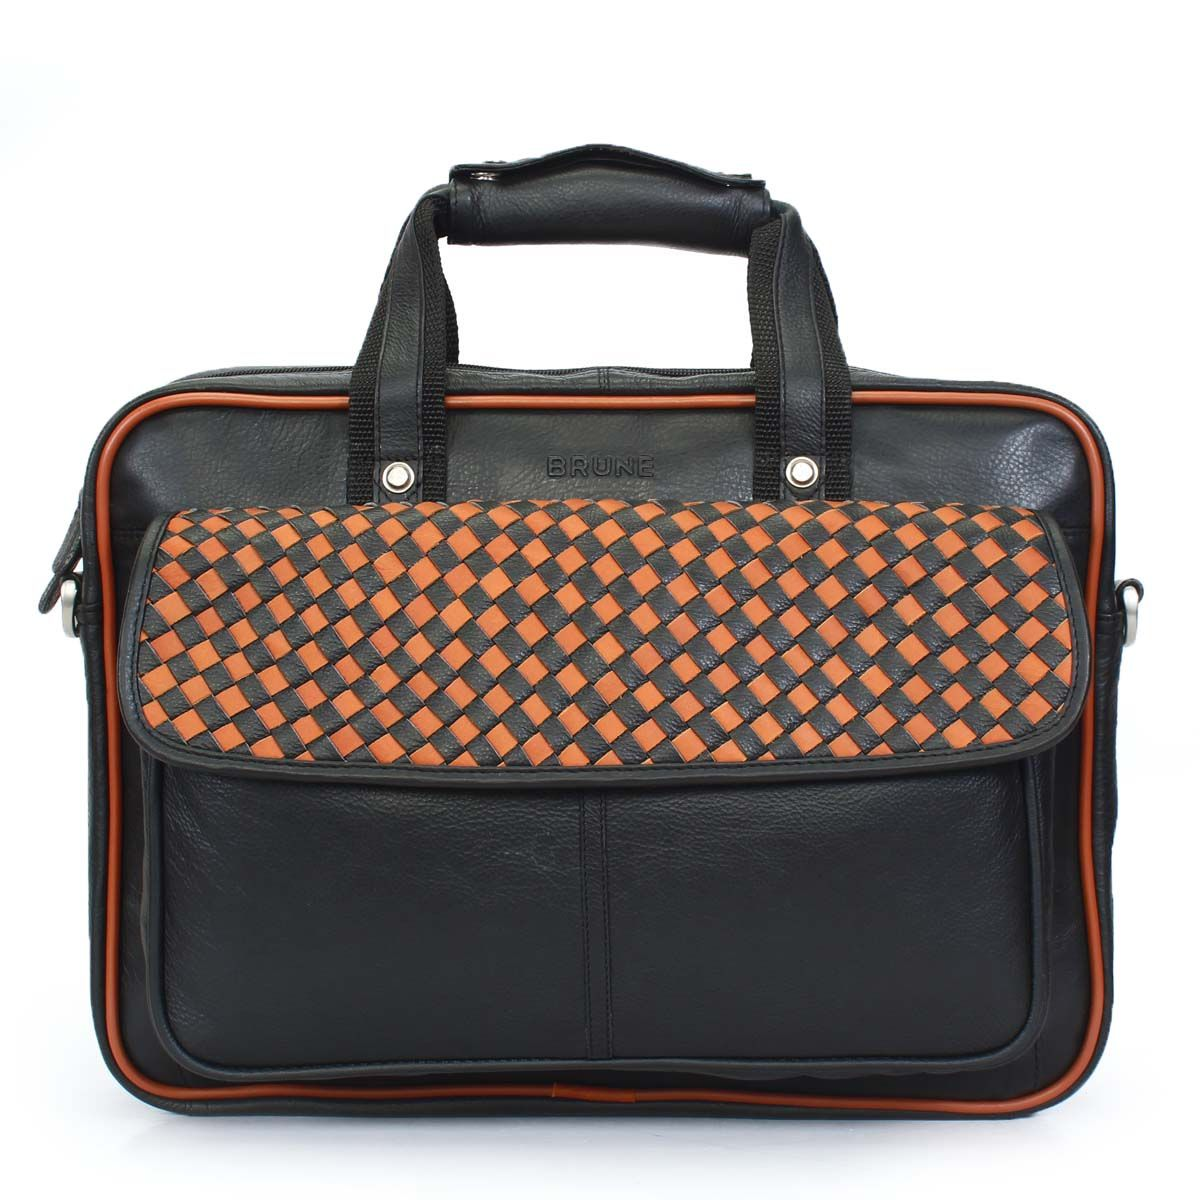 Buy online #BRUNE BLACK/TAN WEAVING OFFICE MESSENGER #BRIEFCASE @ voganow.com for Rs.6,999/-